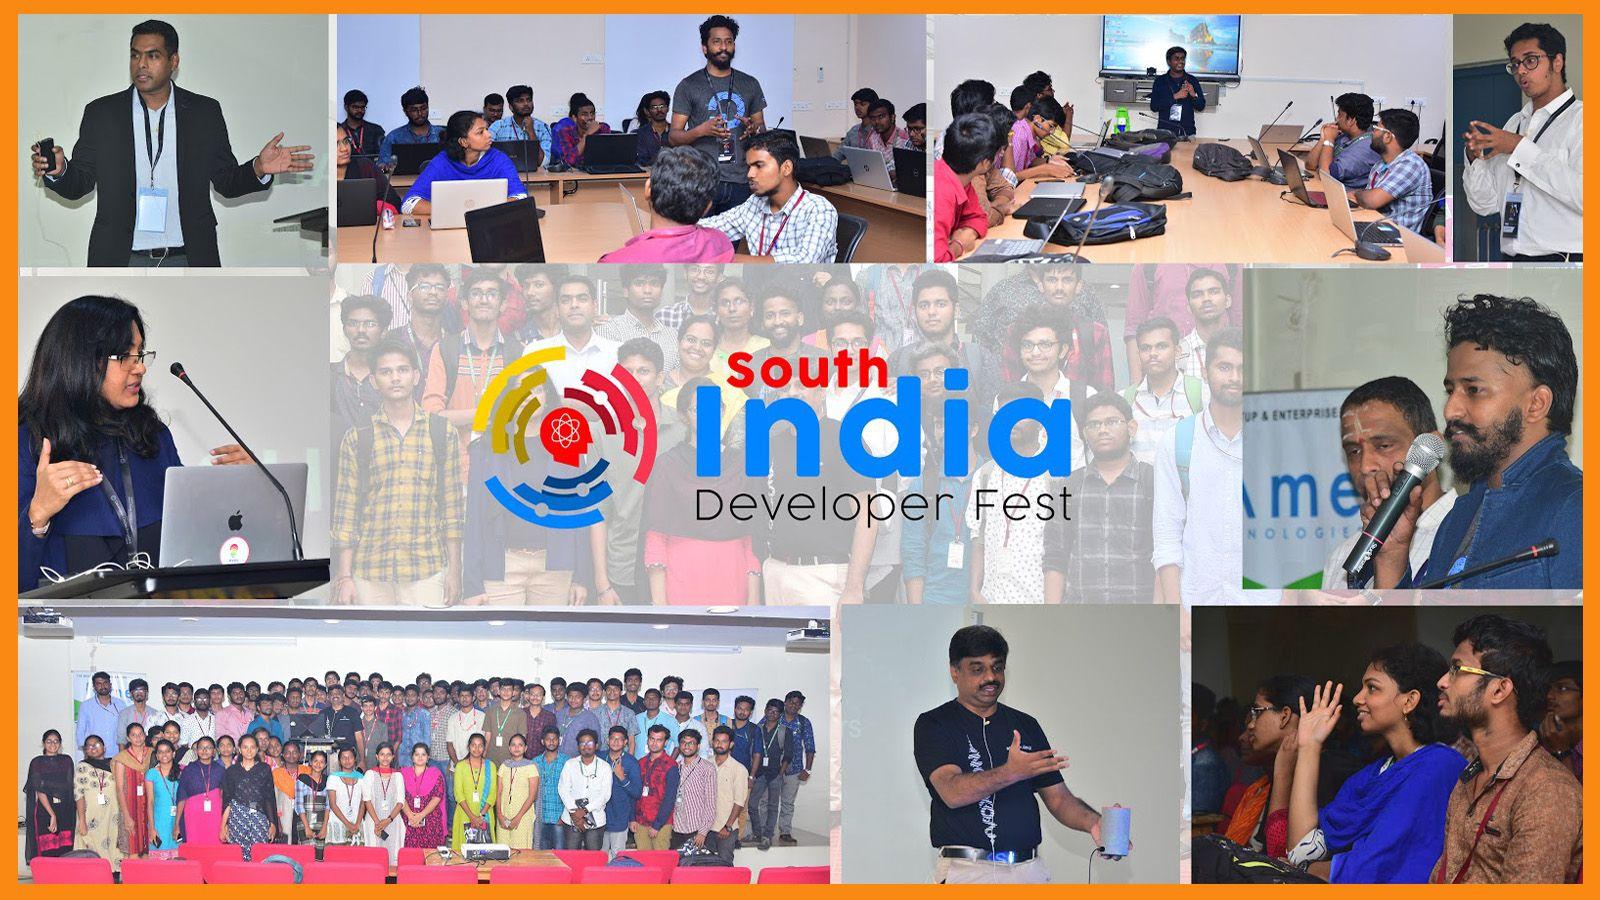 South India Developer fest 2019